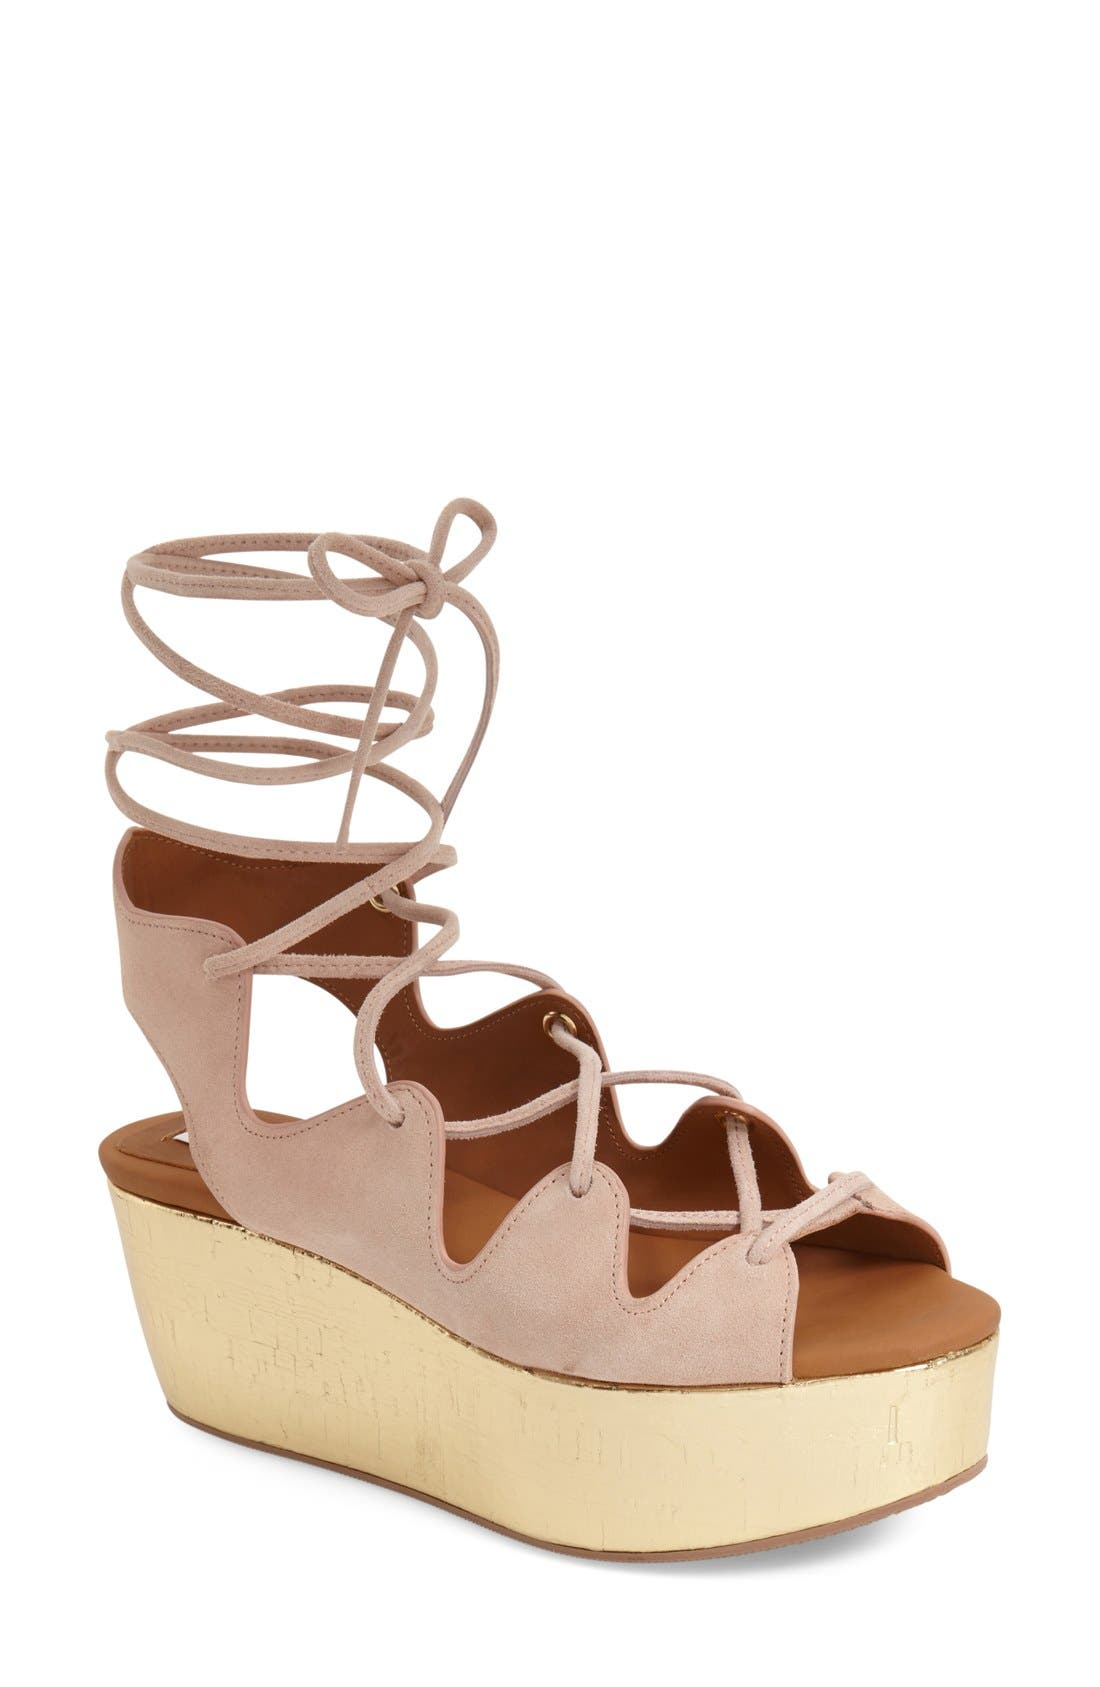 Alternate Image 1 Selected - See by Chloé 'Liana' Platform Wedge Sandal (Women)